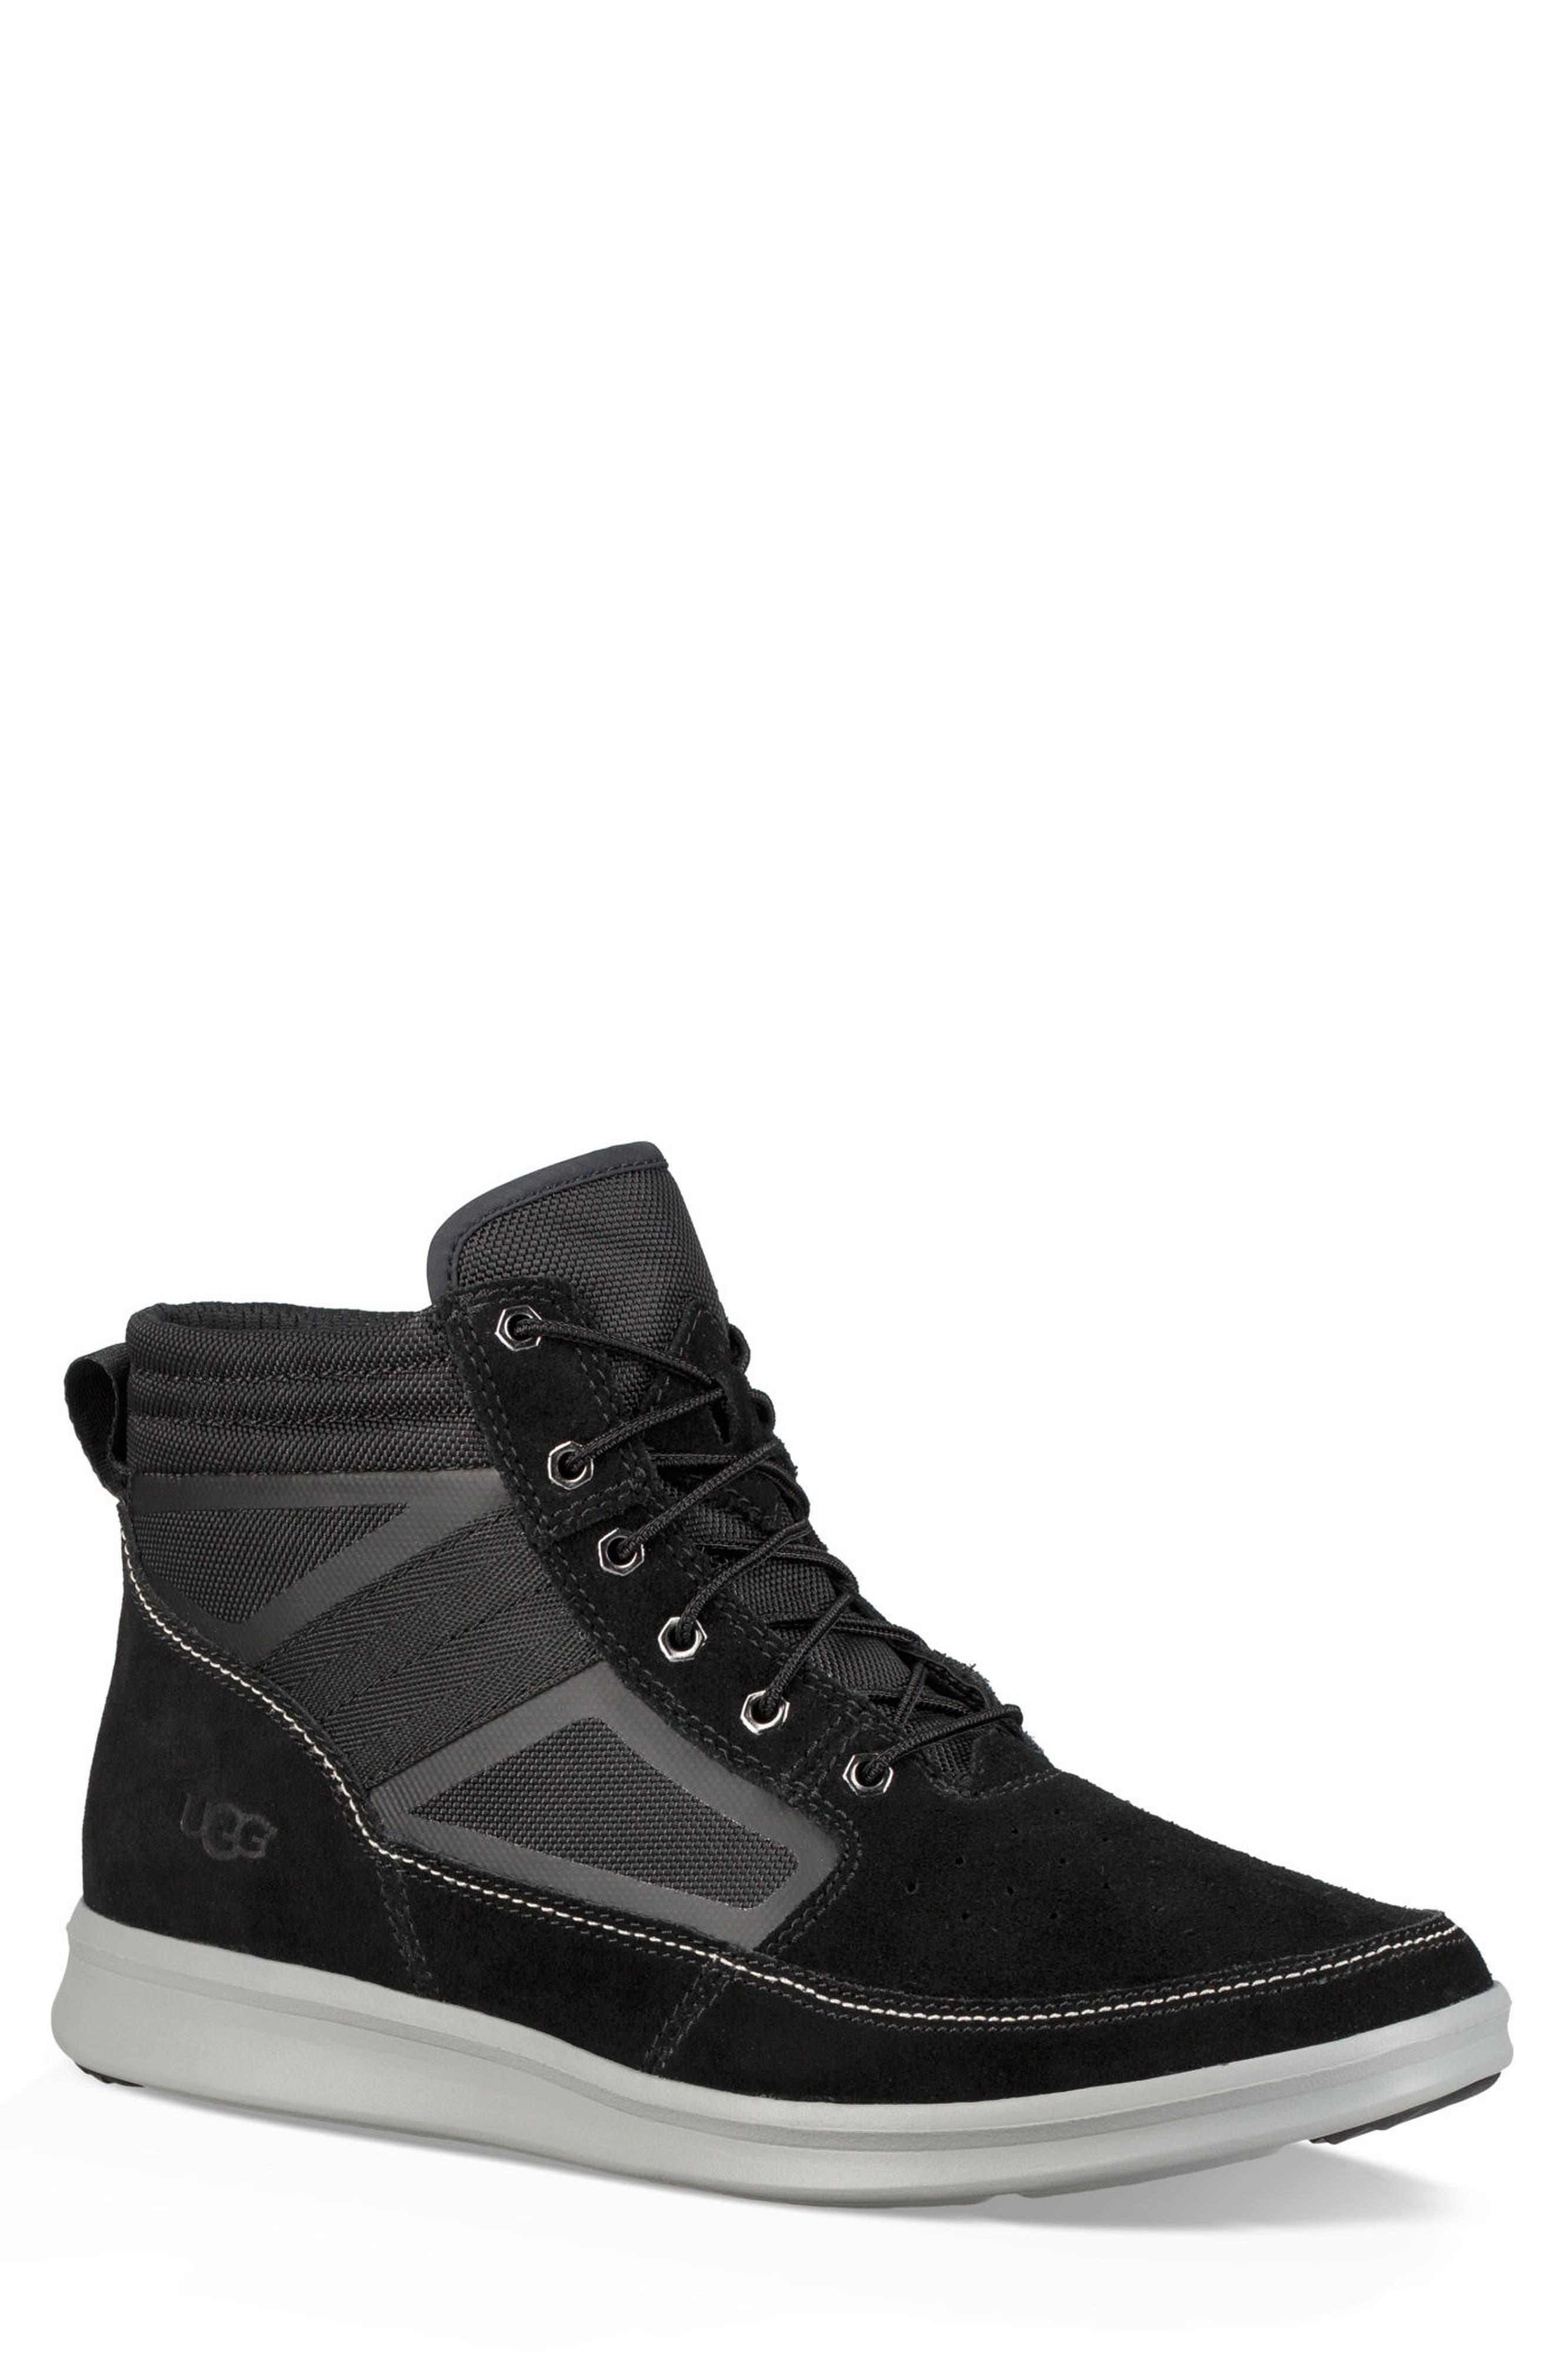 Hepner Moc Toe Boot,                         Main,                         color, 001